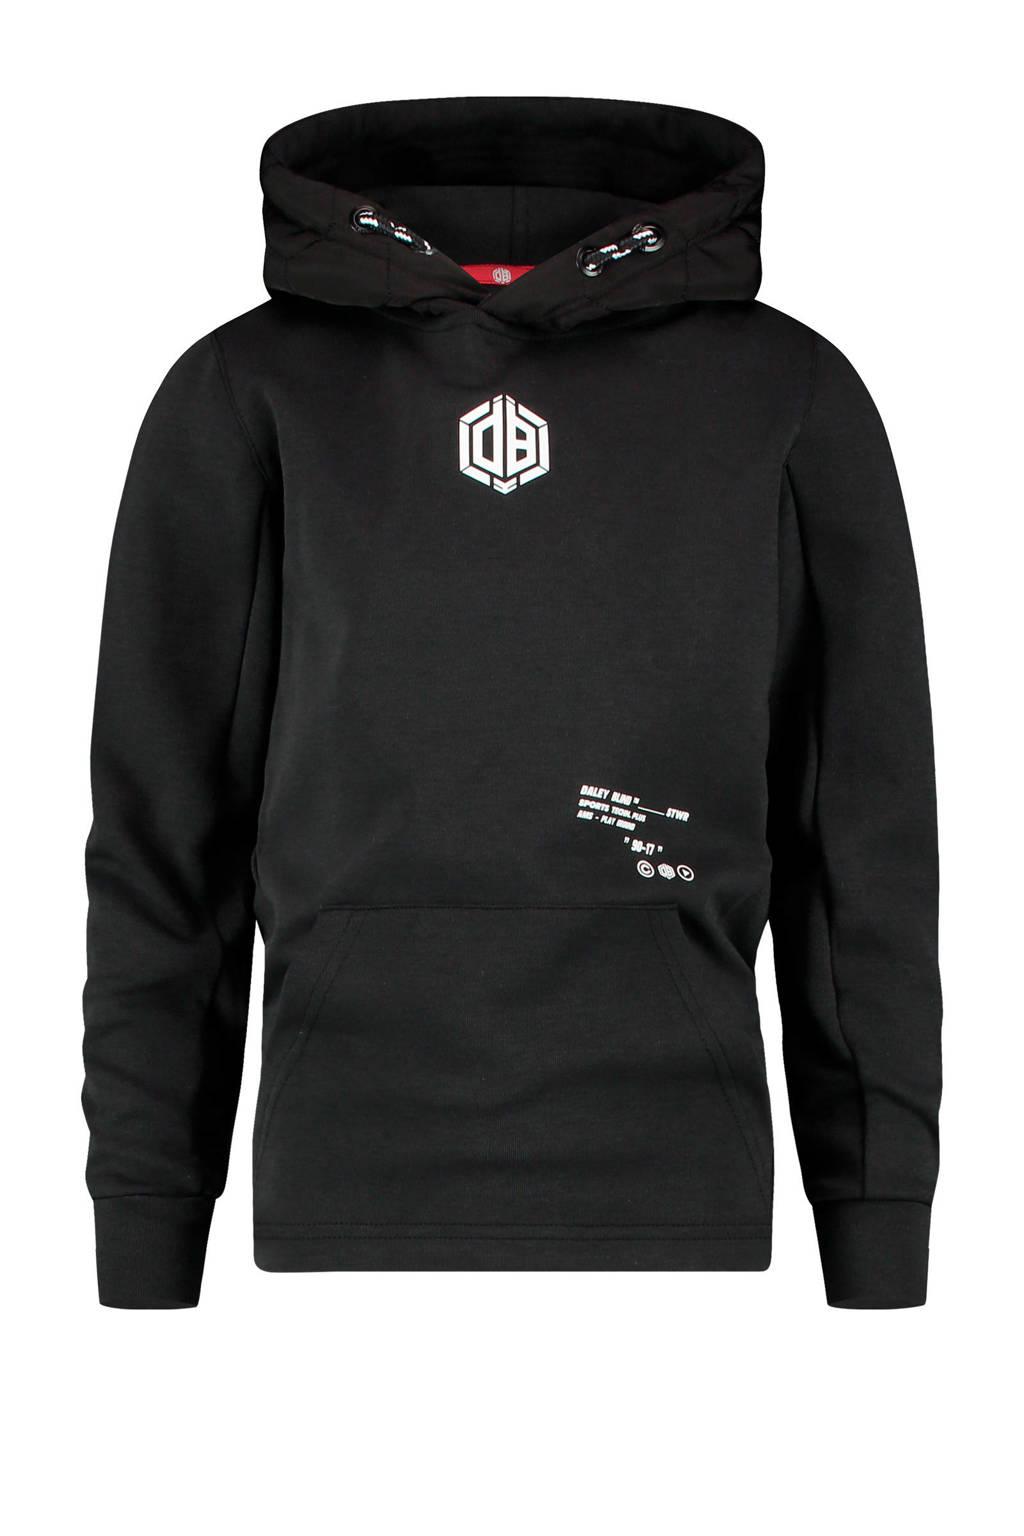 Vingino Daley Blind hoodie Nessil met logo zwart, Zwart